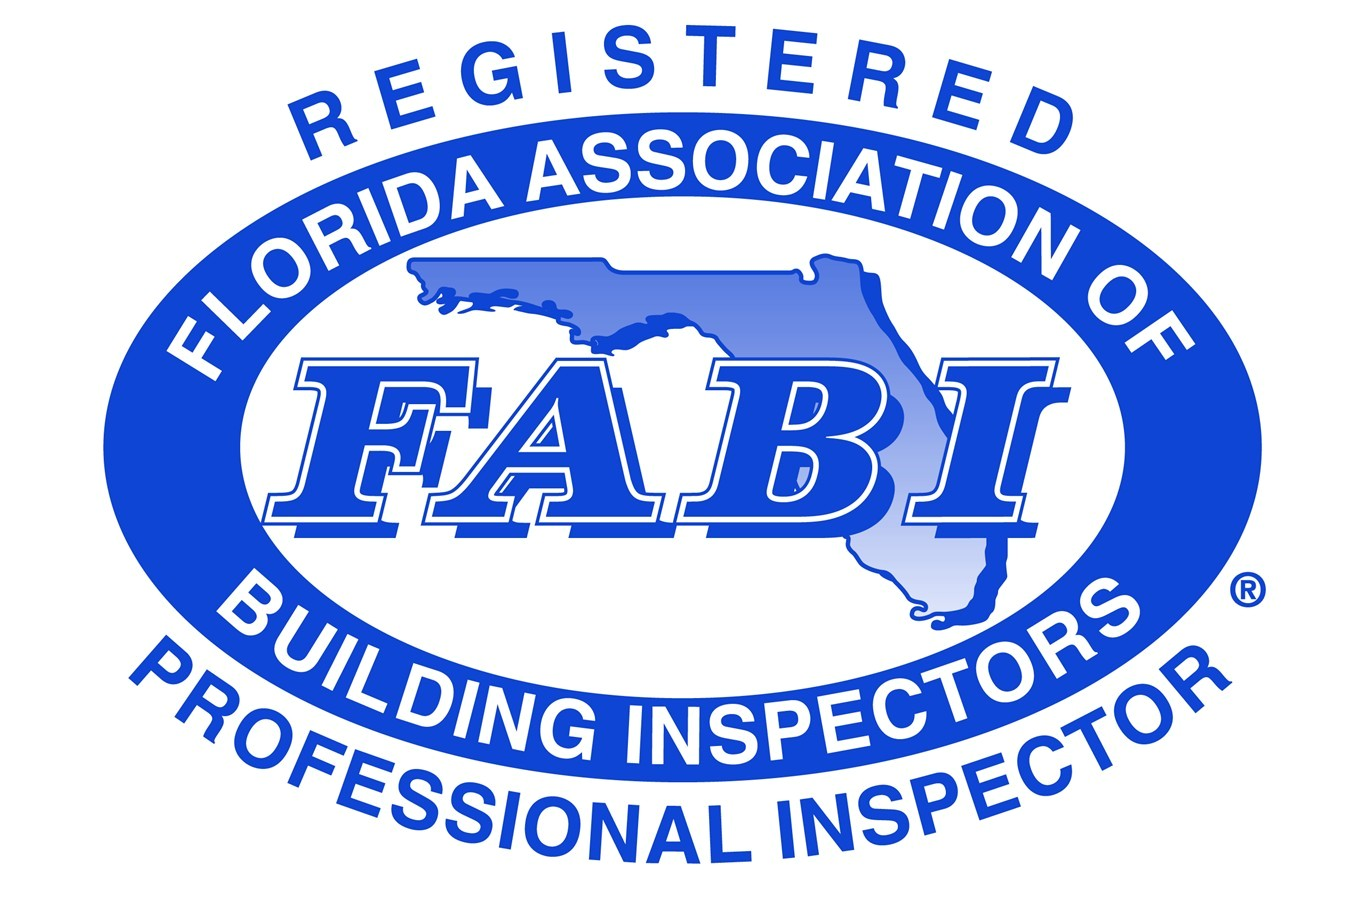 florida association of builders logo